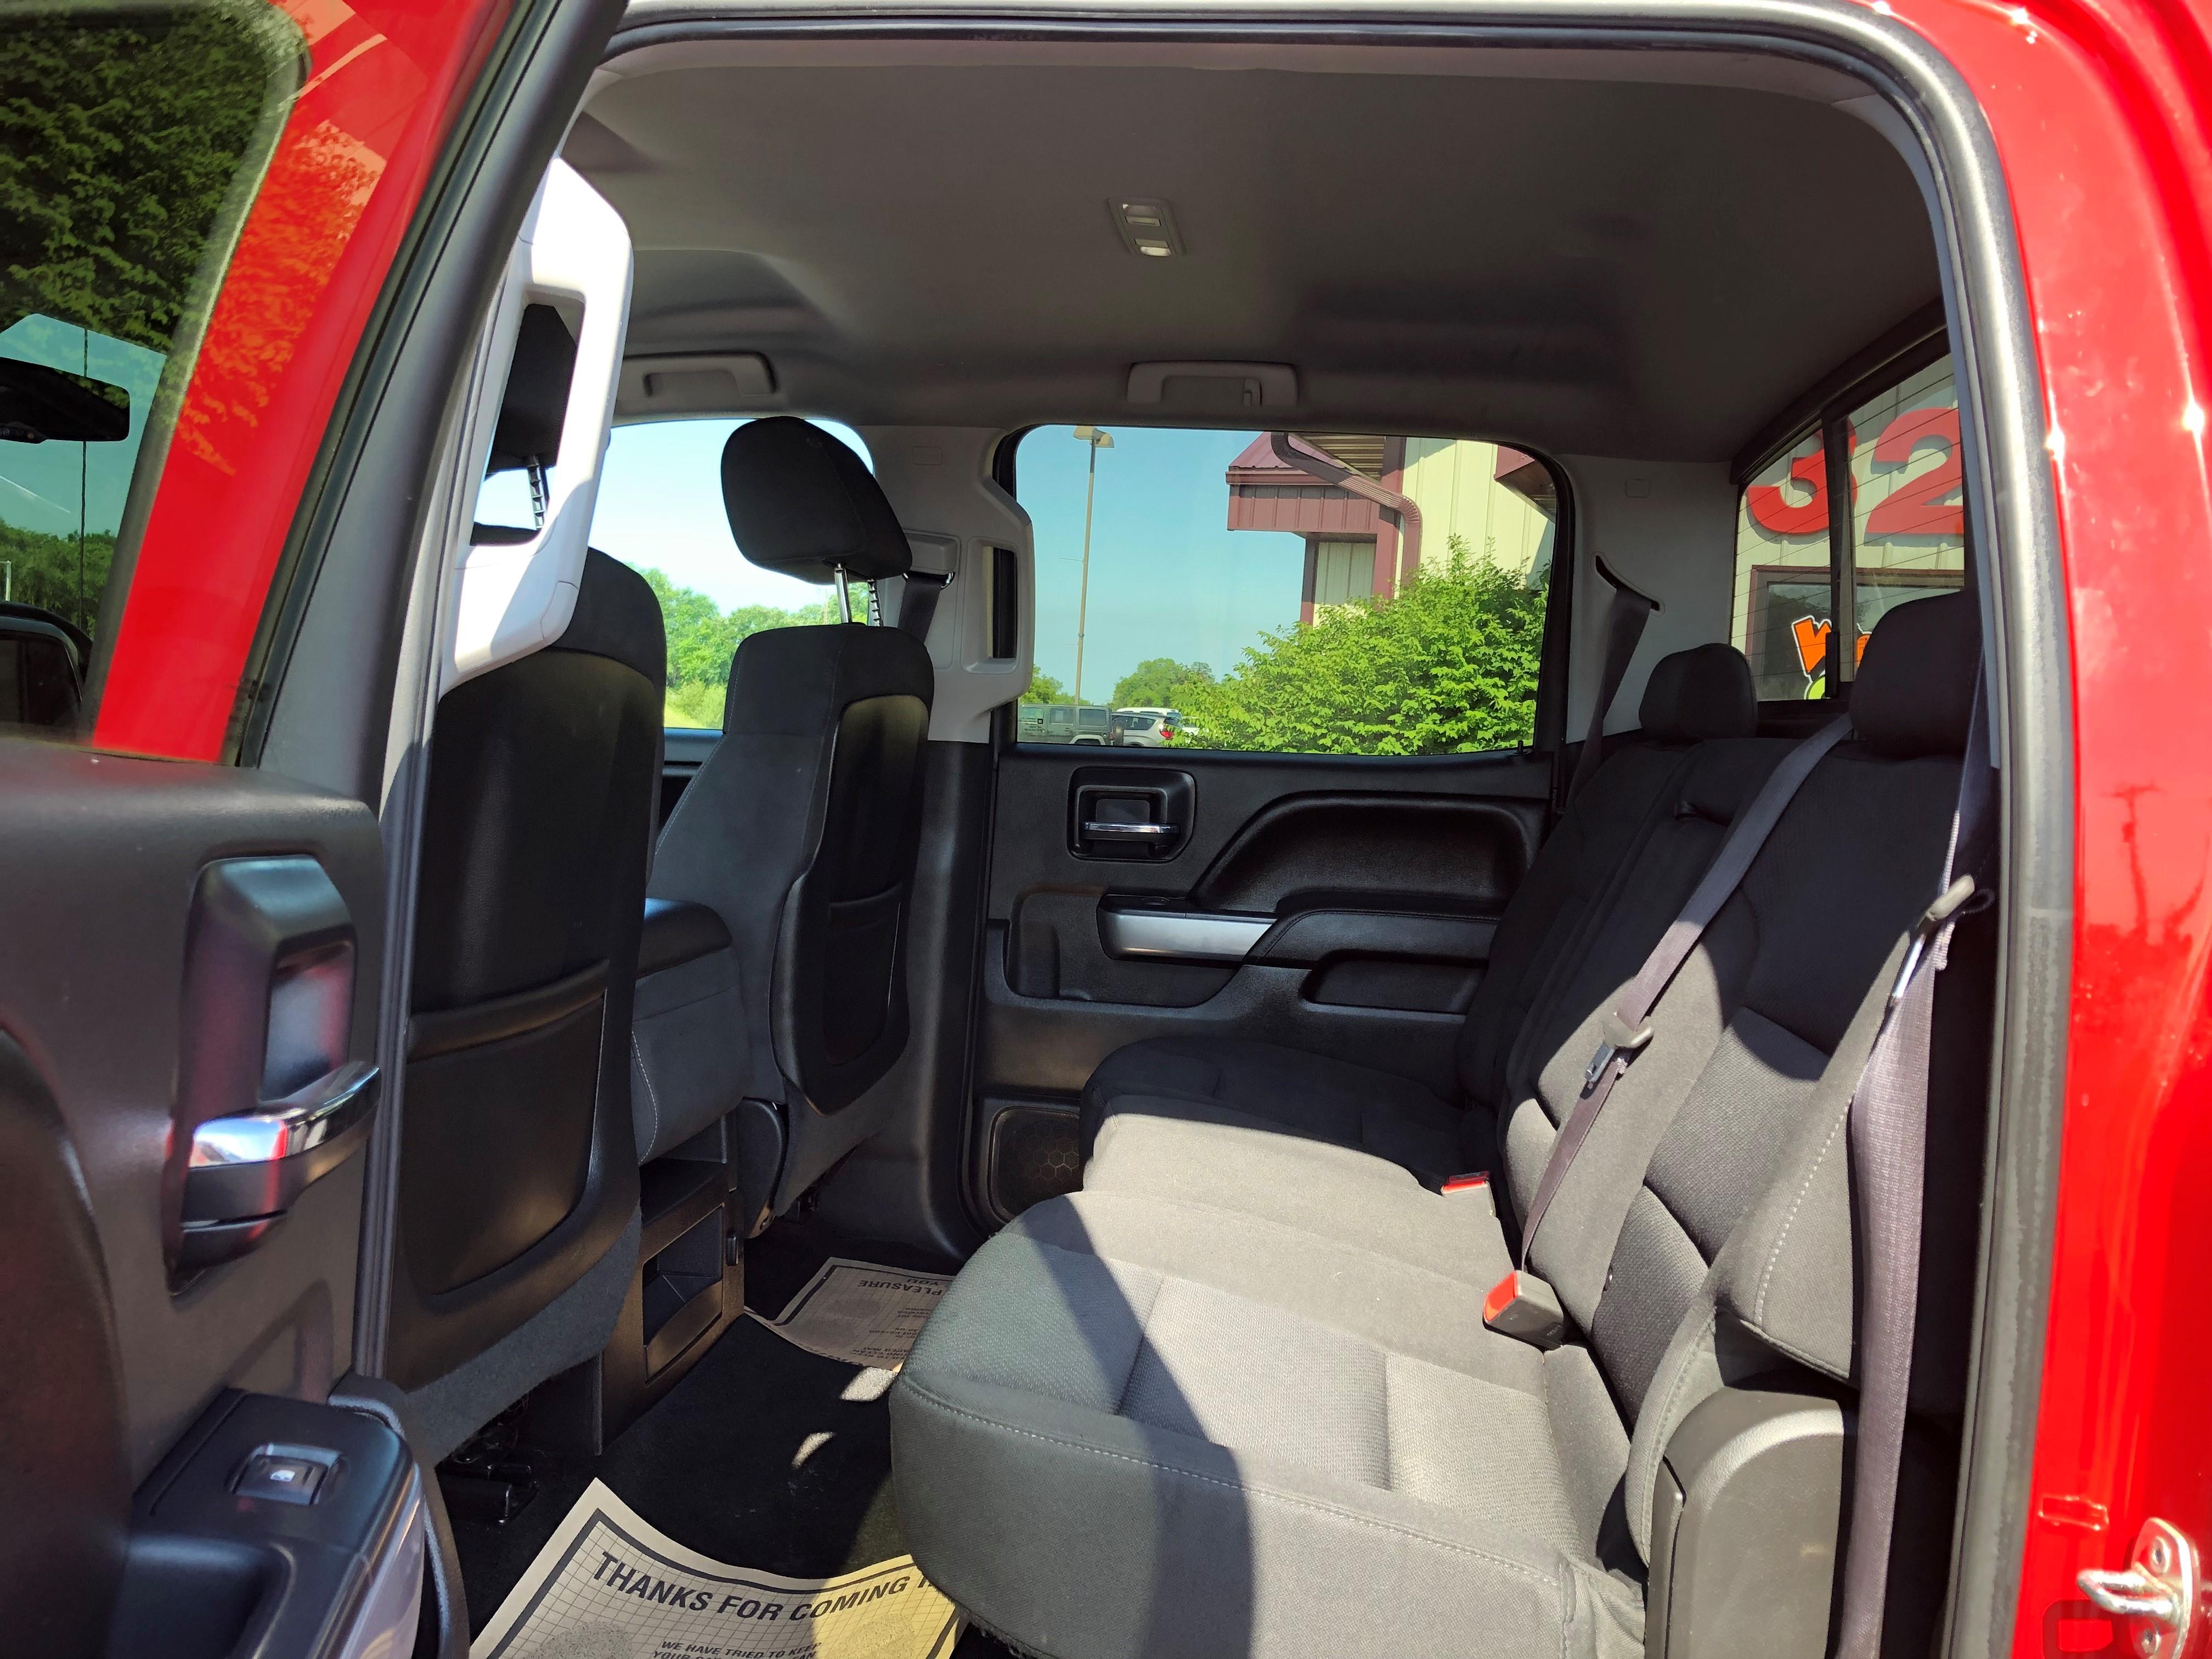 used vehicle - Truck CHEVROLET SILVERADO 1500 2015